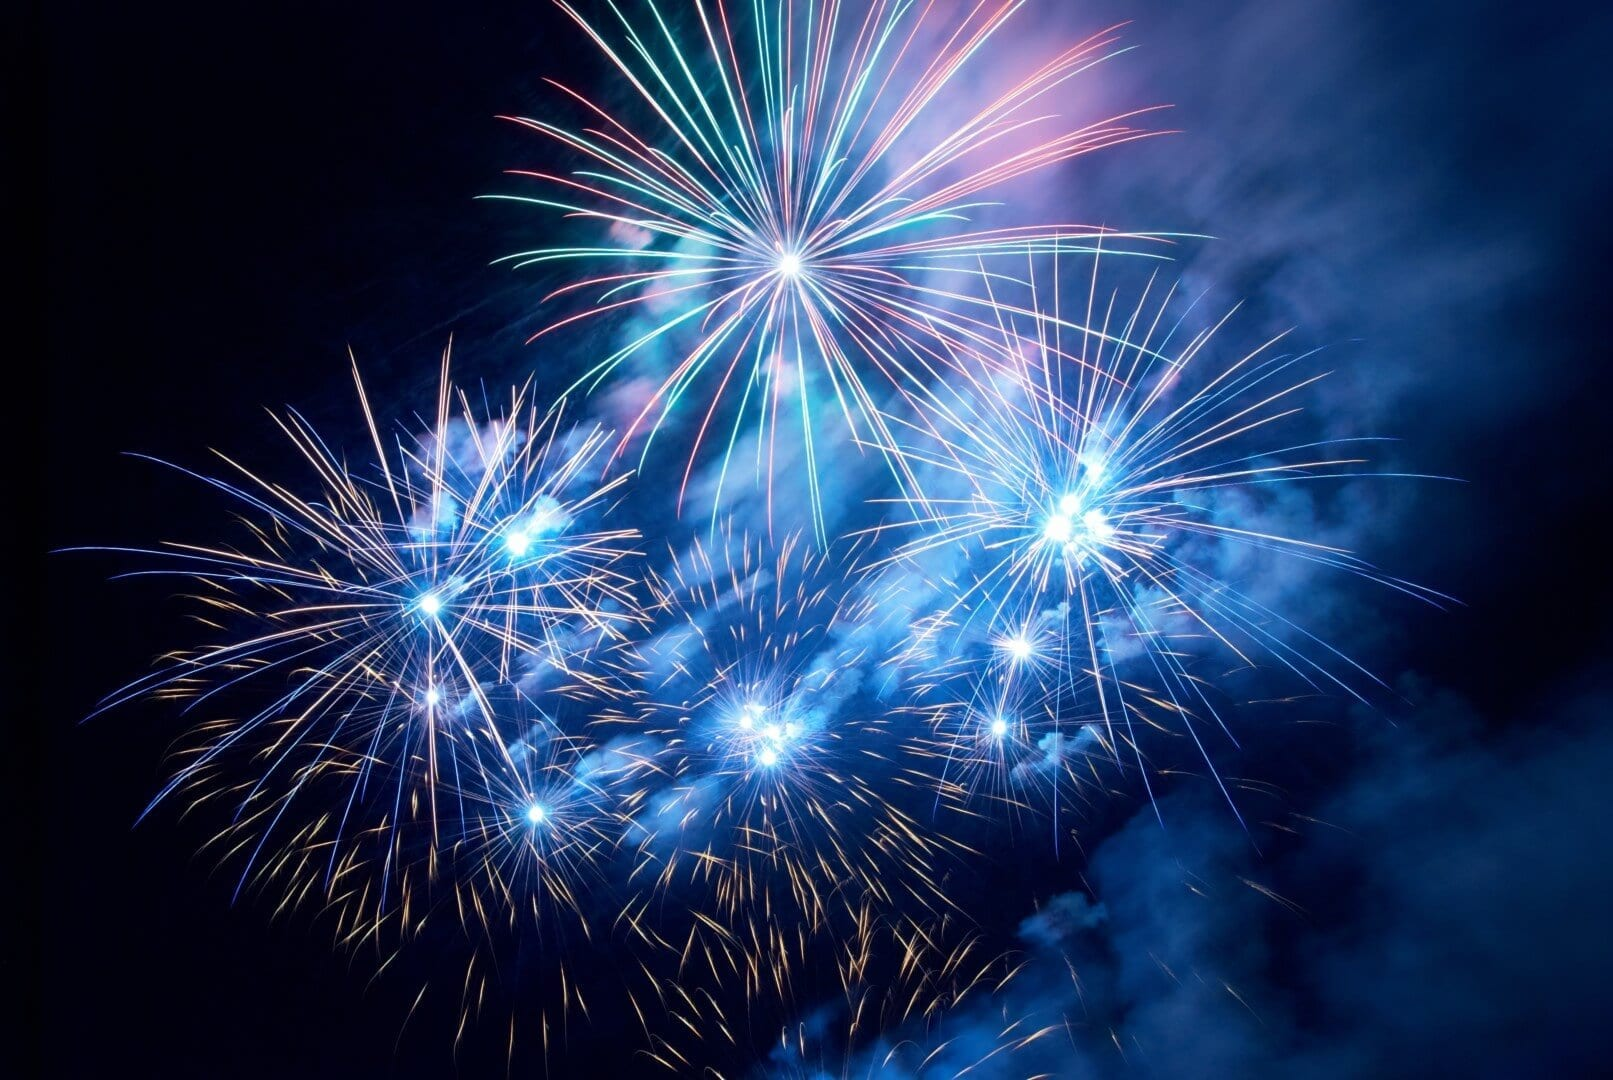 Boonton's Fireman's fireworks